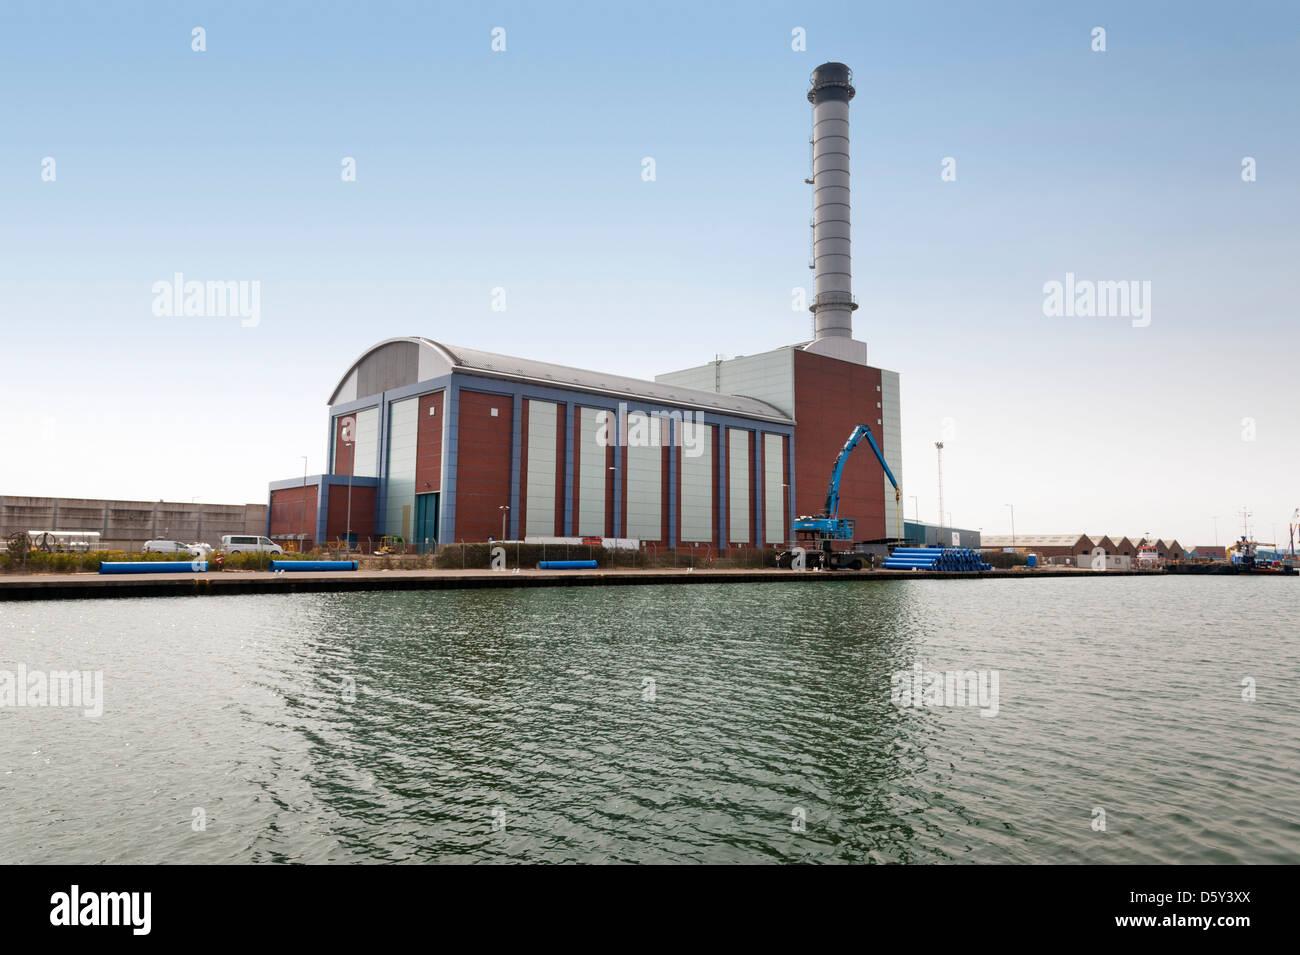 Shoreham gas-fired power station on the River Adur, Shoreham, East Sussex, UK - Stock Image